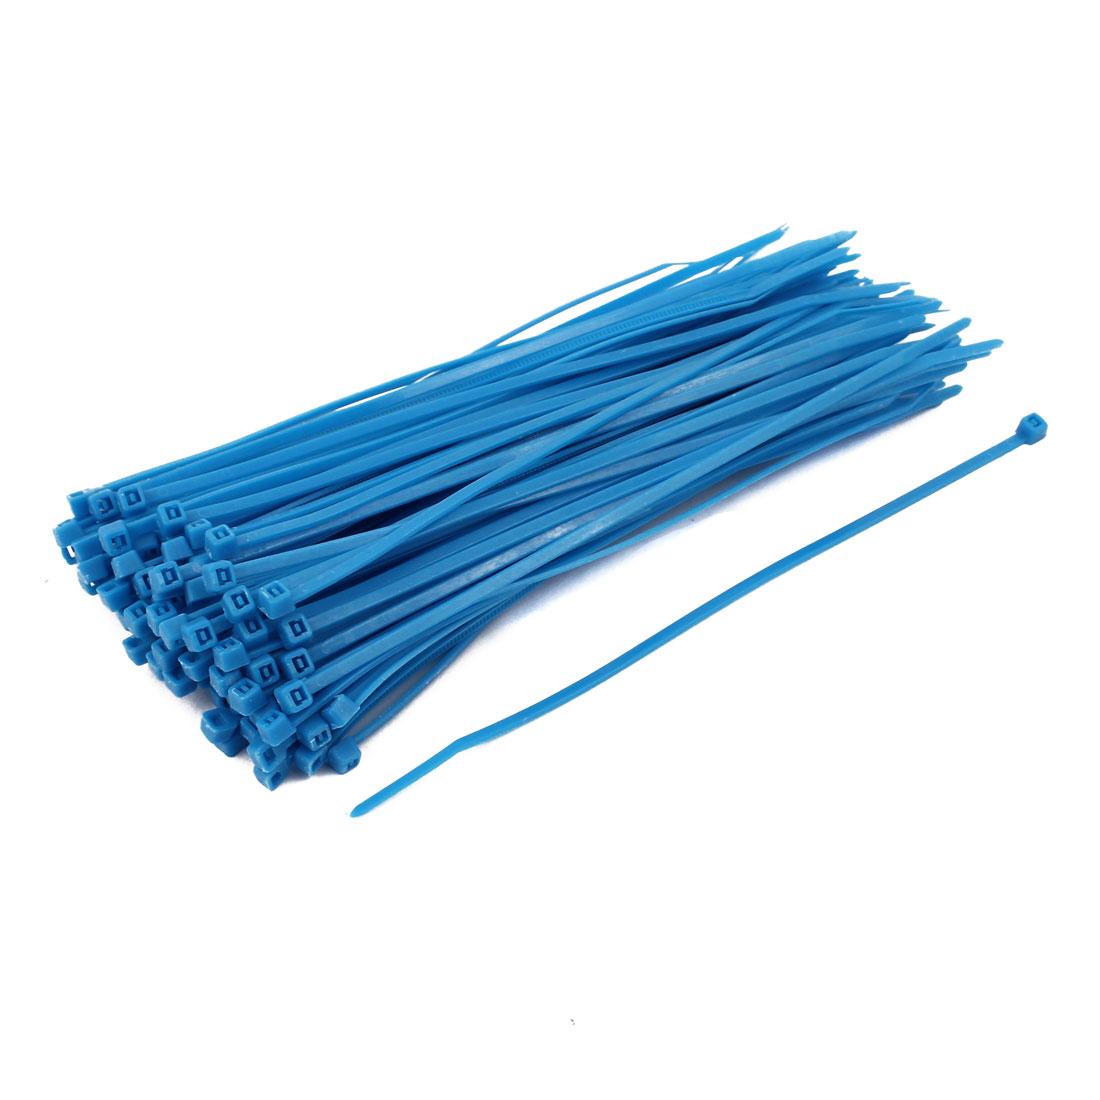 3mm x 150mm Self Locking Nylon Cable Ties Industrial Wire Zip Ties Blue 100pcs